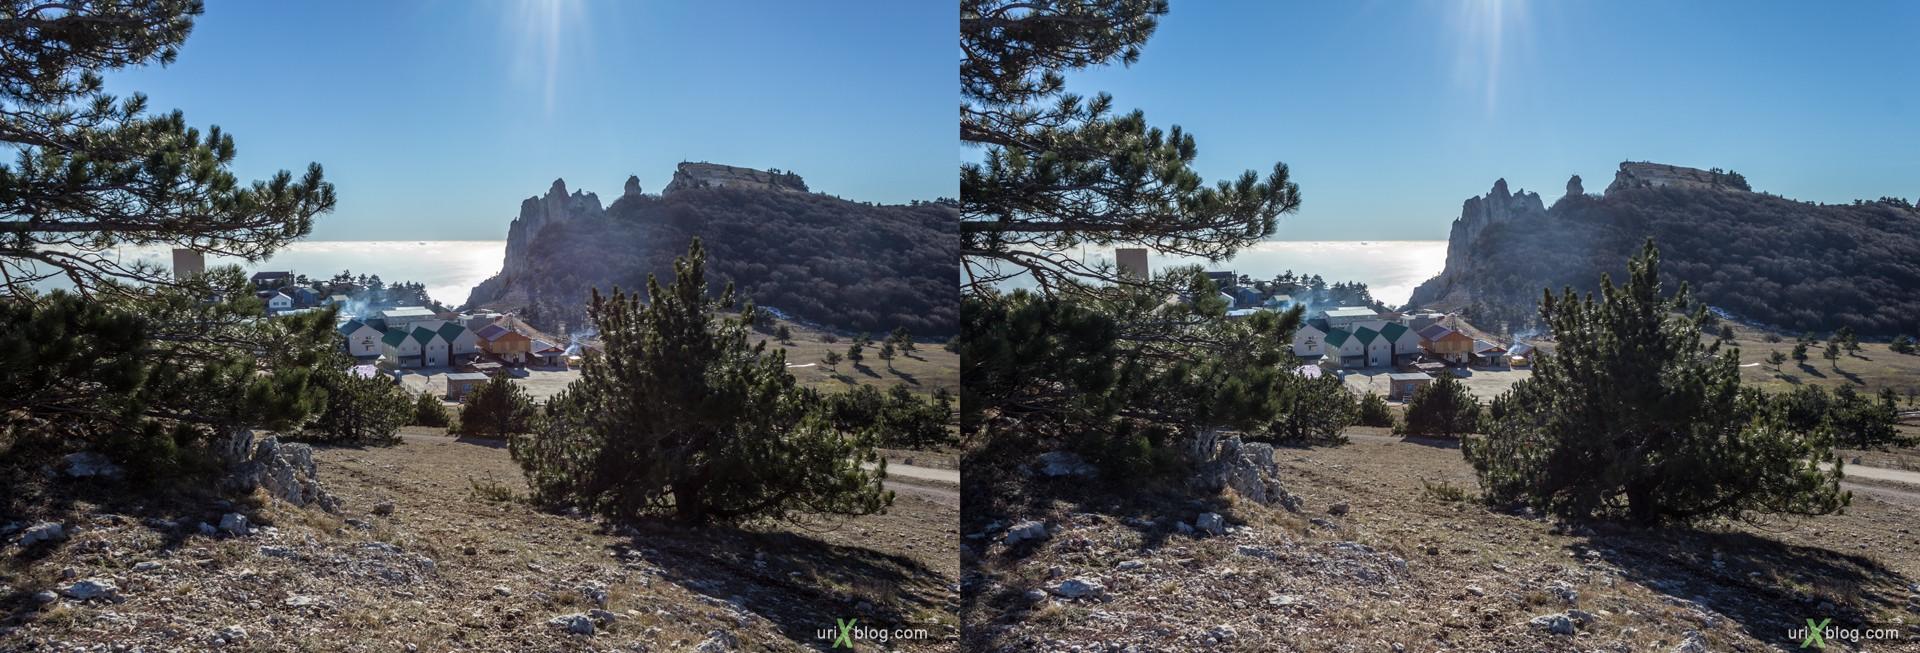 2012, Ai-Petri, mountains, Crimea, Russia, Ukraine, winter, 3D, stereo pair, cross-eyed, crossview, cross view stereo pair, stereoscopic